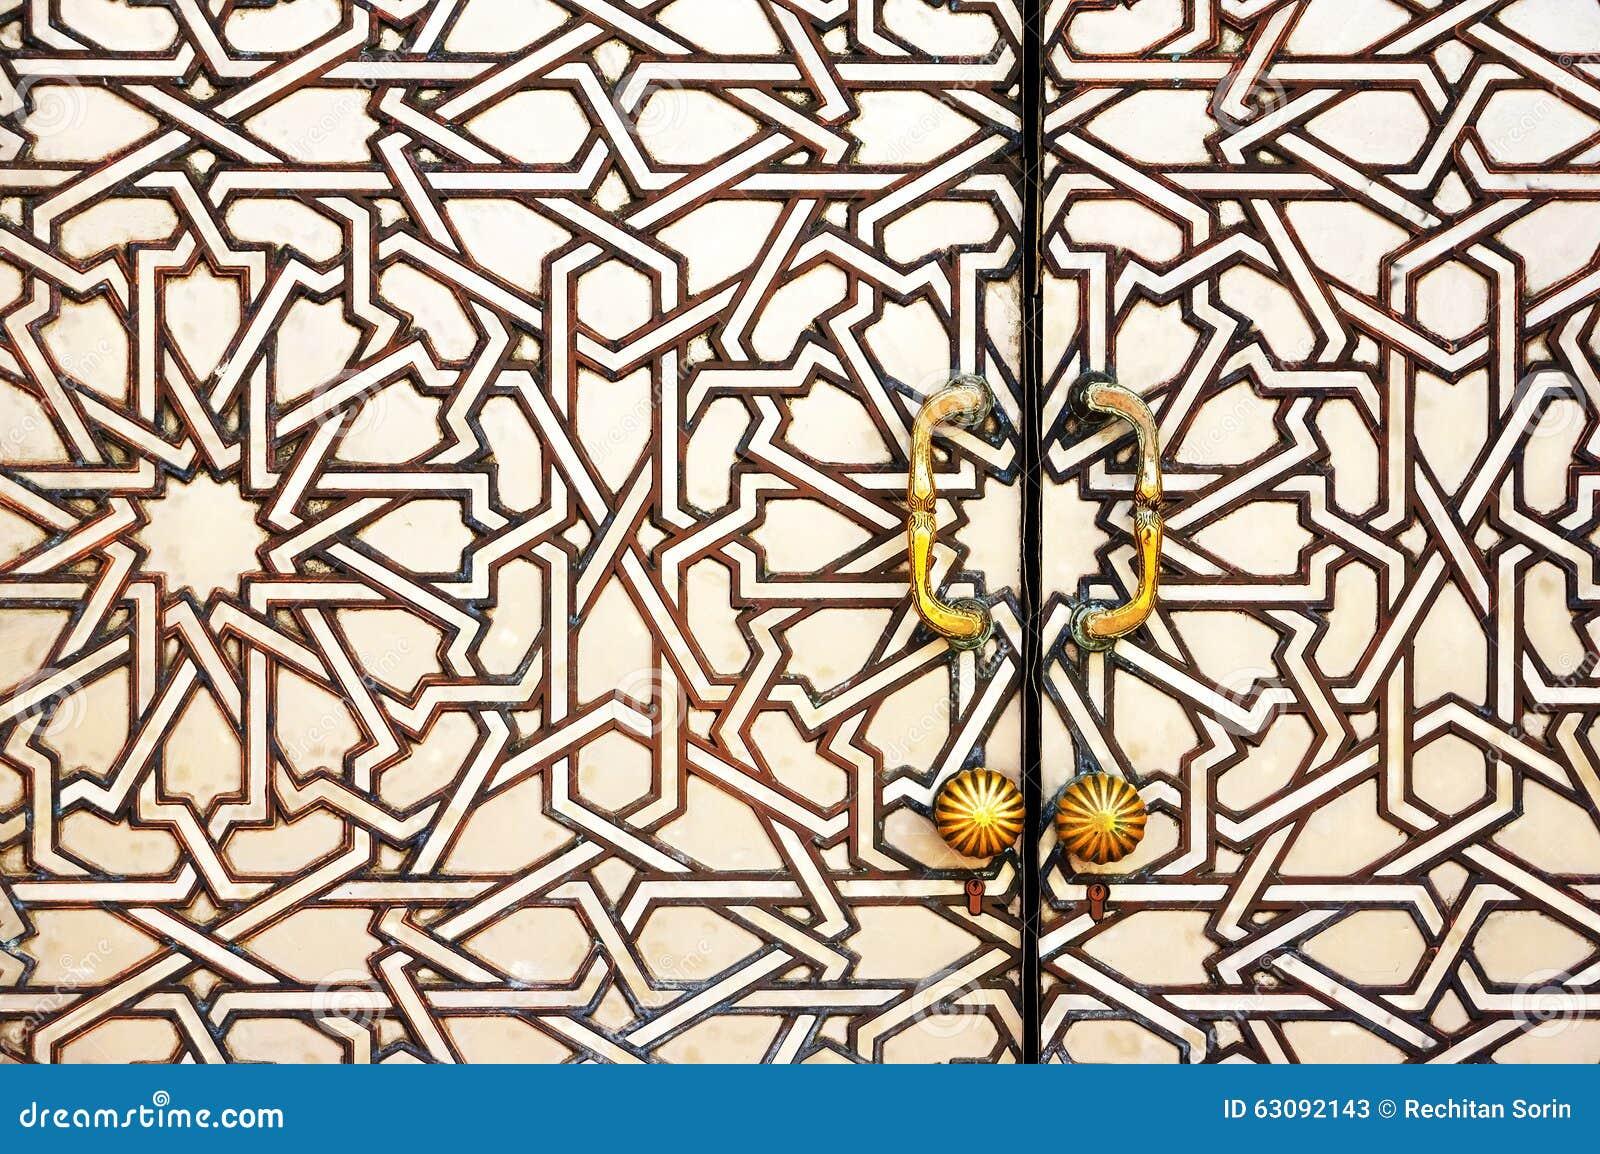 Download La mosquée de Hassan II image stock. Image du north, musulmans - 63092143